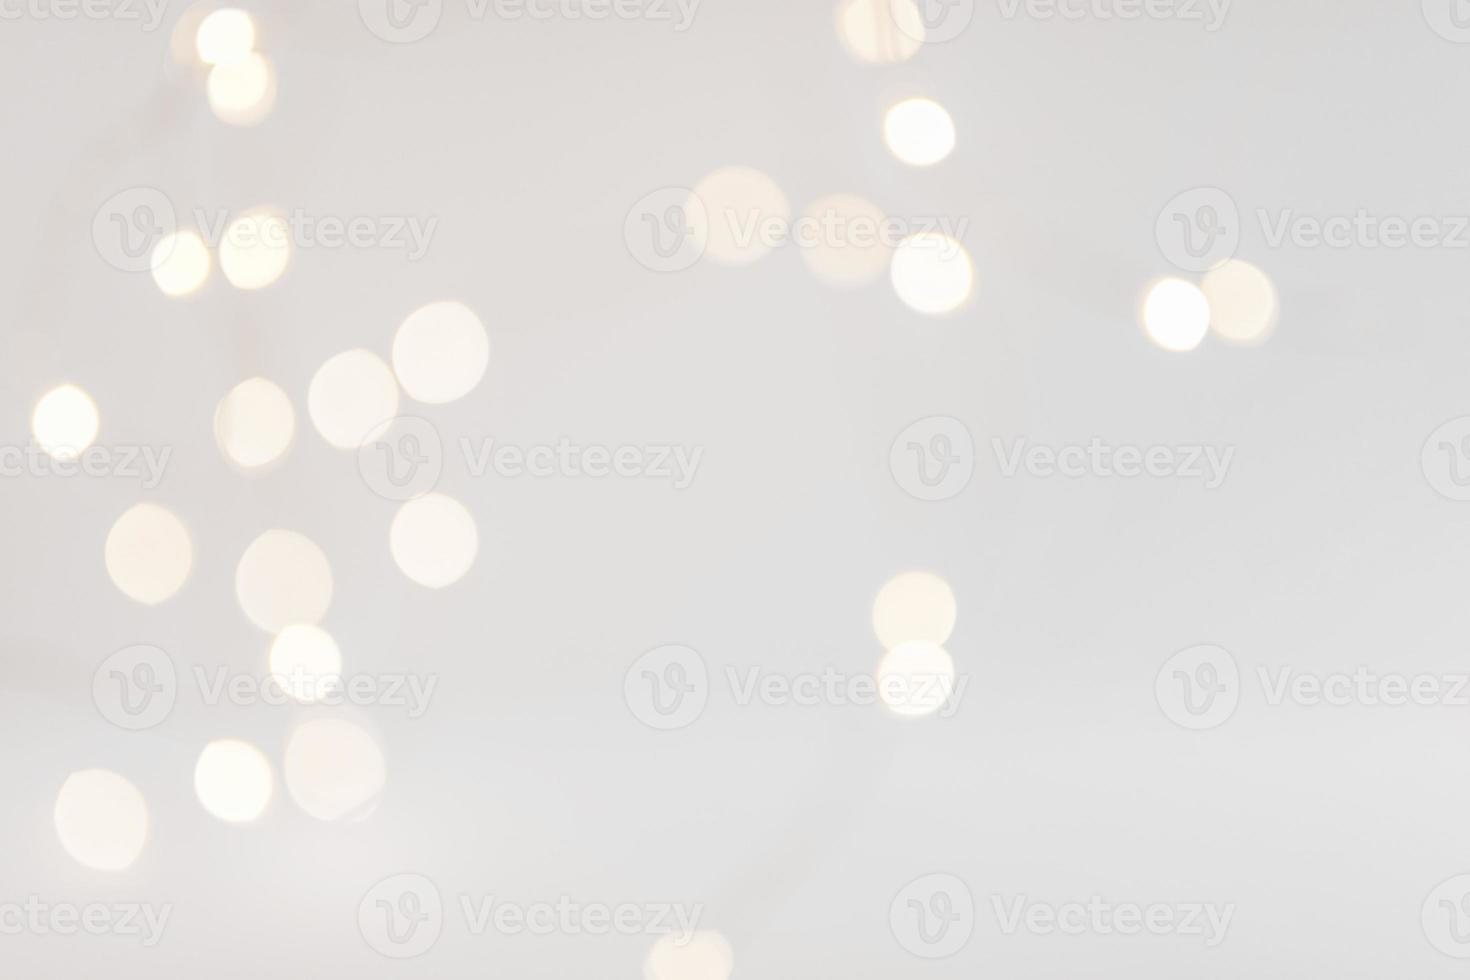 bokeh tänder vit bakgrund foto